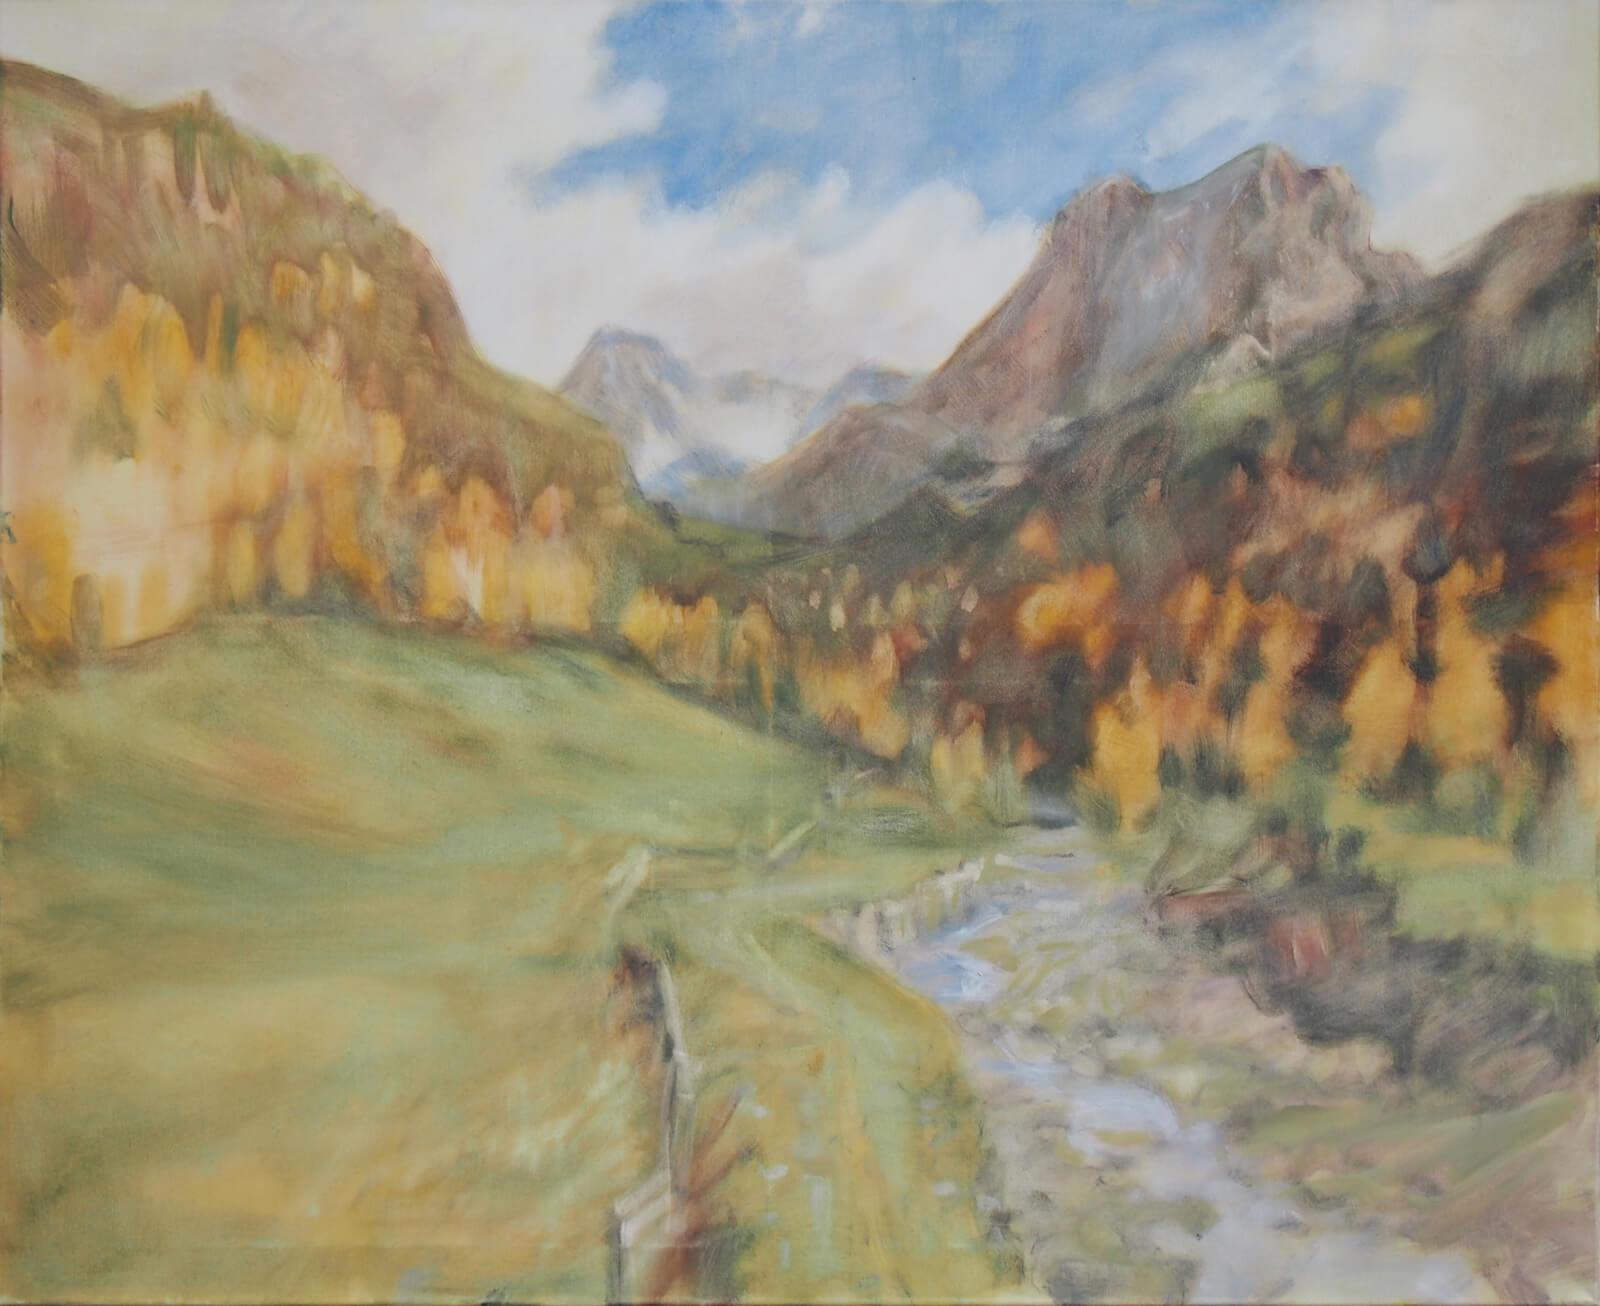 Landschaftsmalerei, en plein air, Freilichtmalerei, Ötztal, Öl auf Leinwand, Tanja Leodolter, Künstlerin